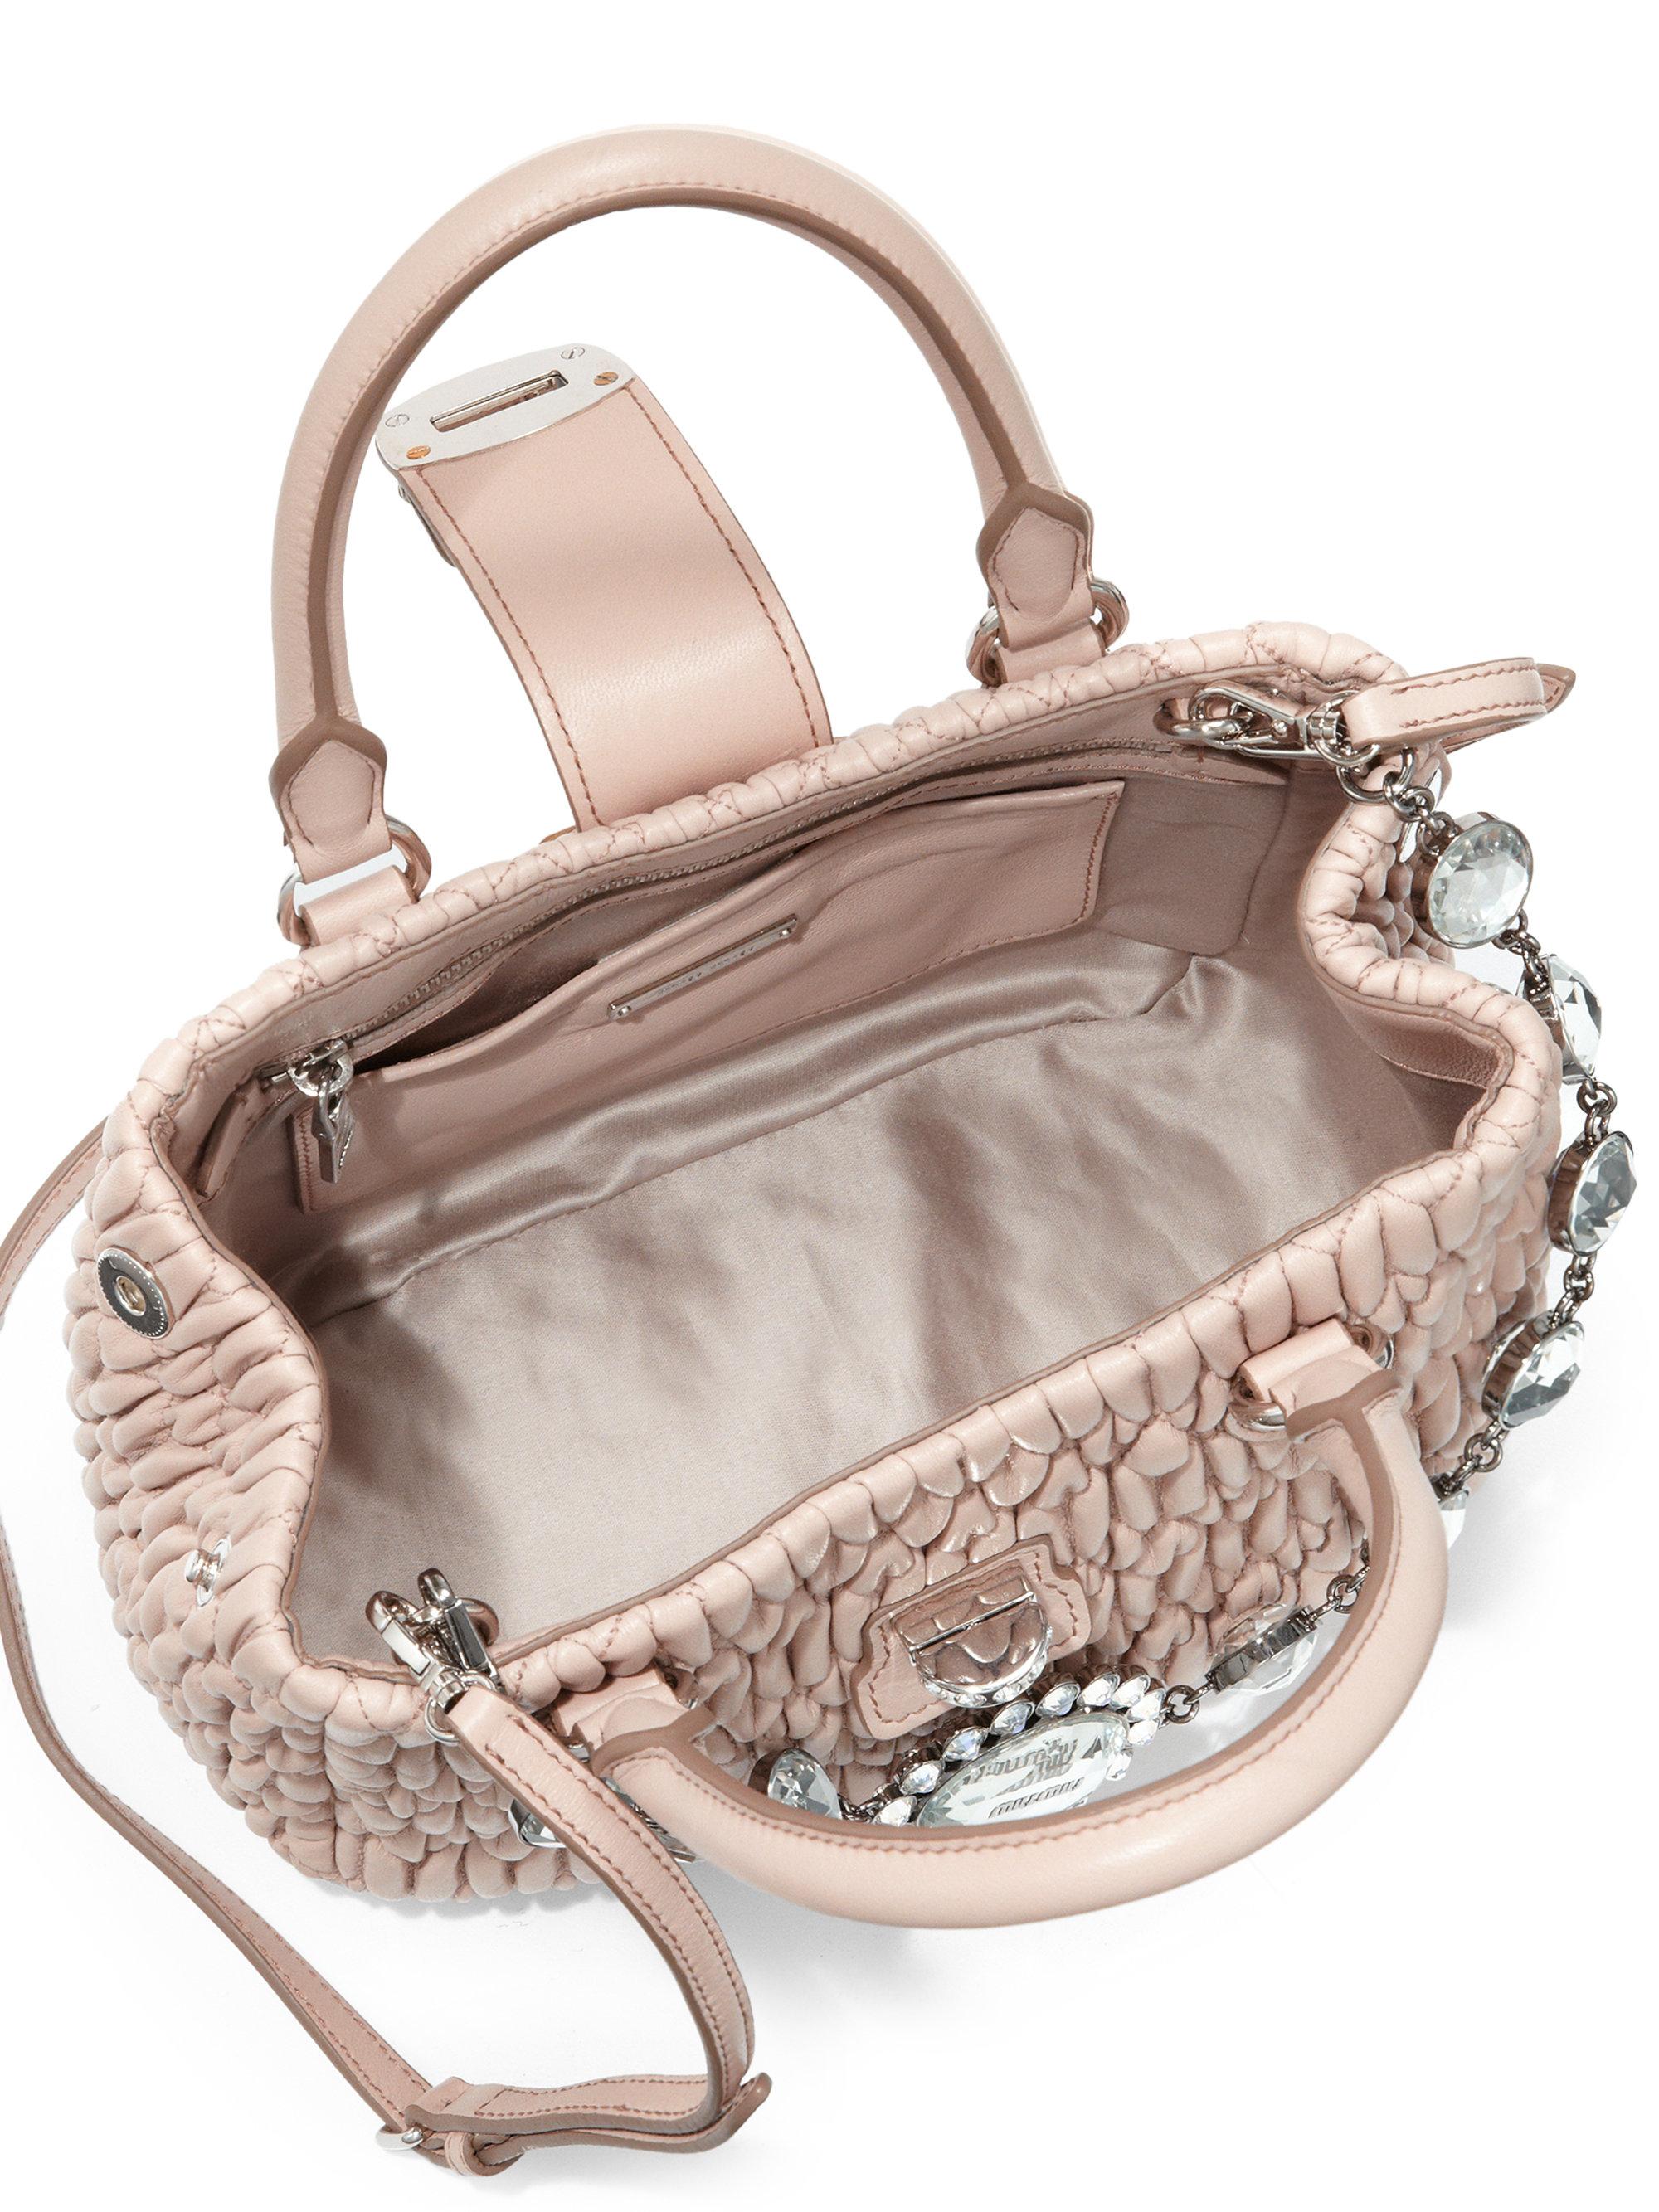 c874011a1606 Miu Miu Velvet Matelasse Quilted Belt Bag